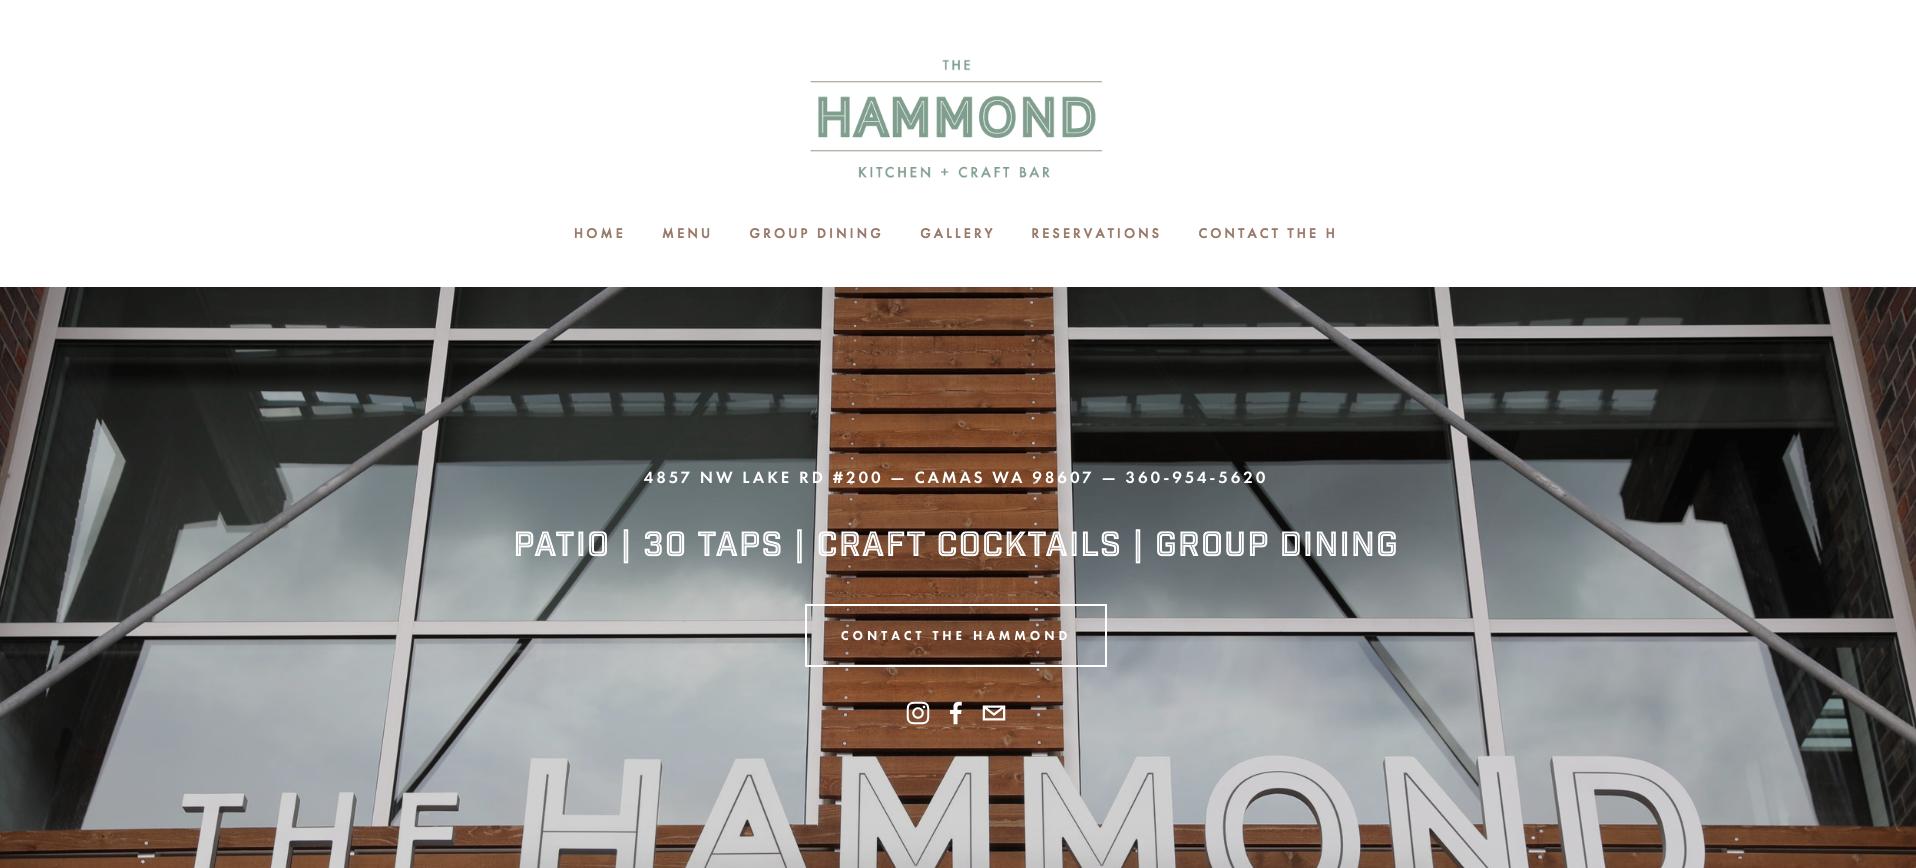 THE HAMMOND - U.S. RESTAURANT WEBSITE